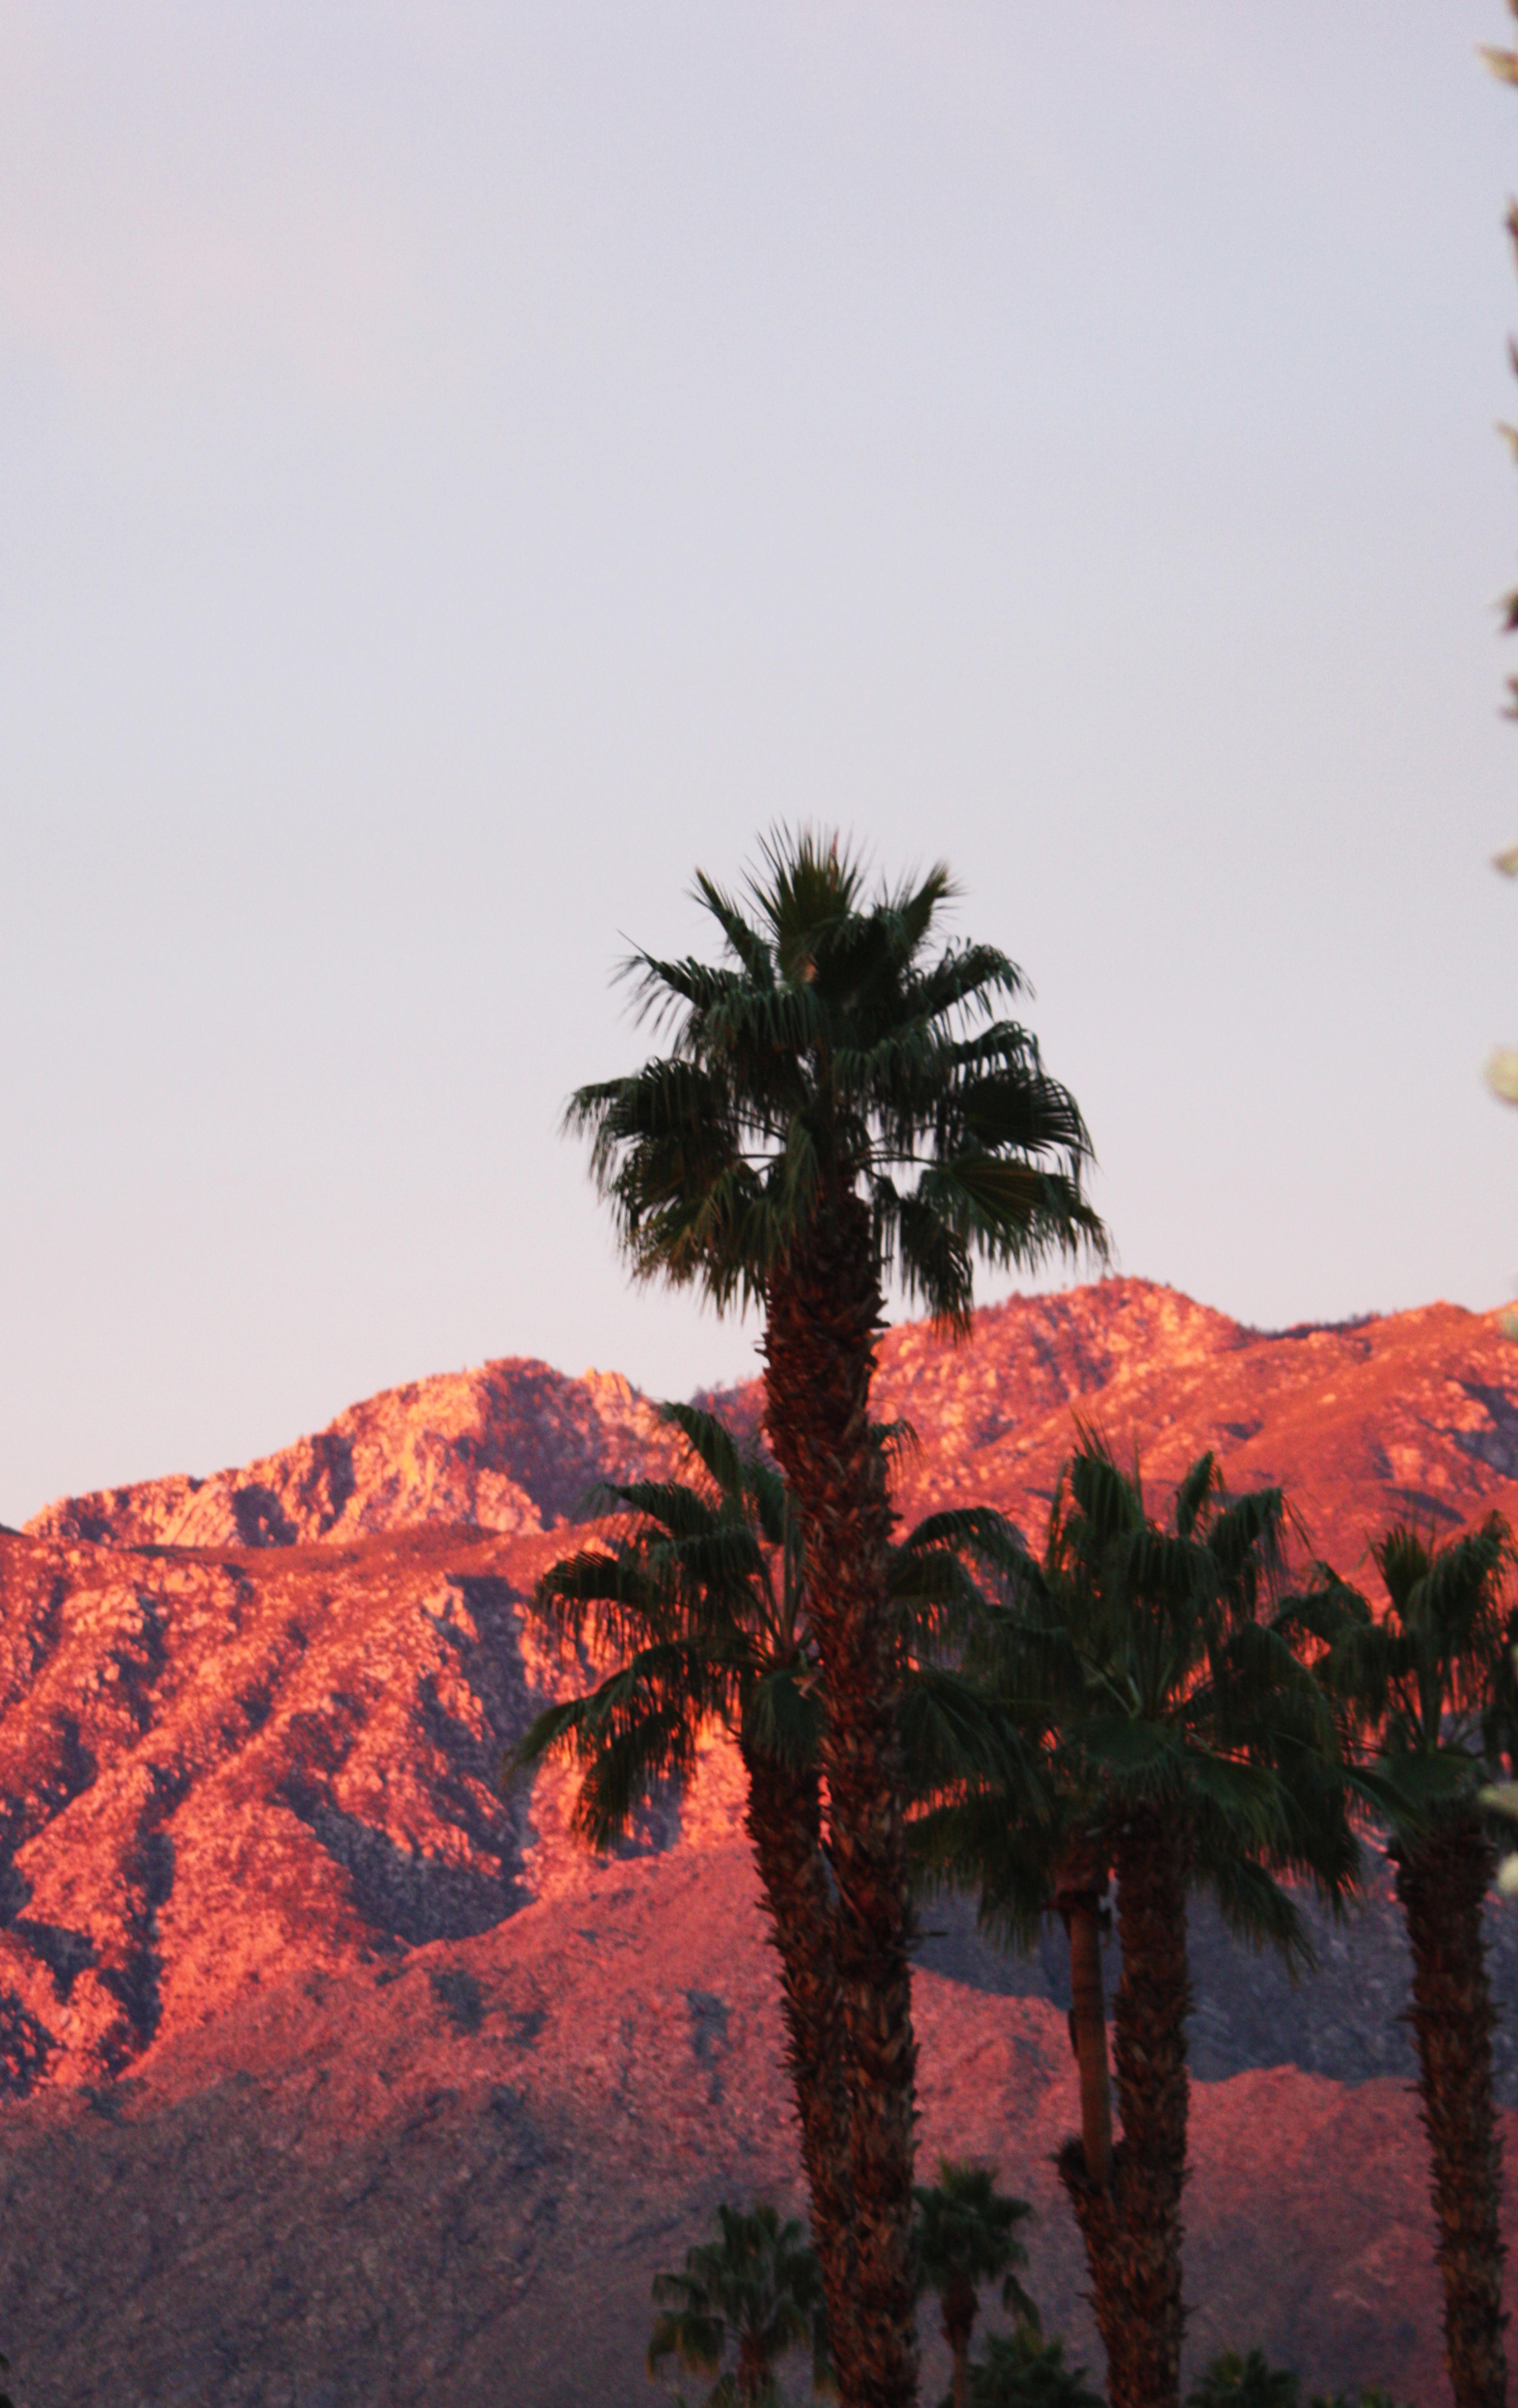 A New Day on San Jacintos - Palm Springs